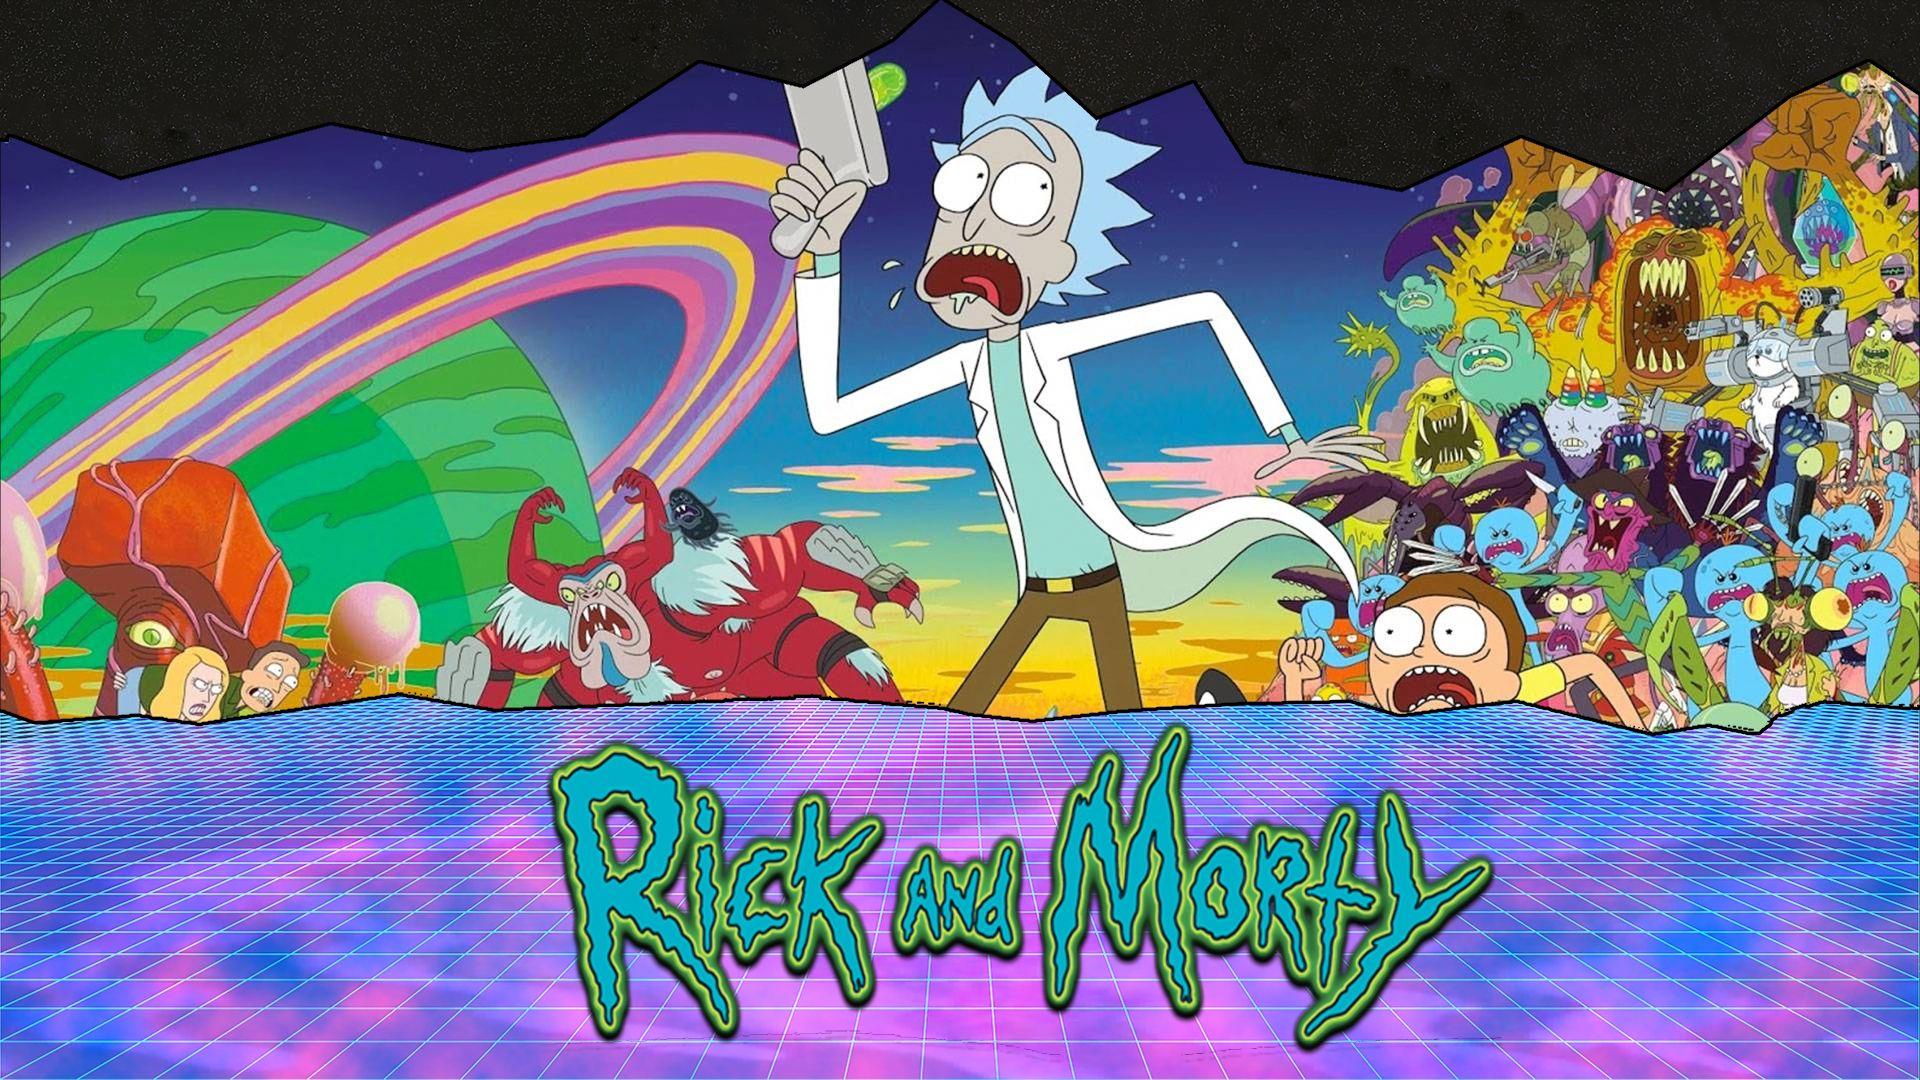 Rick and Morty hd wallpaper